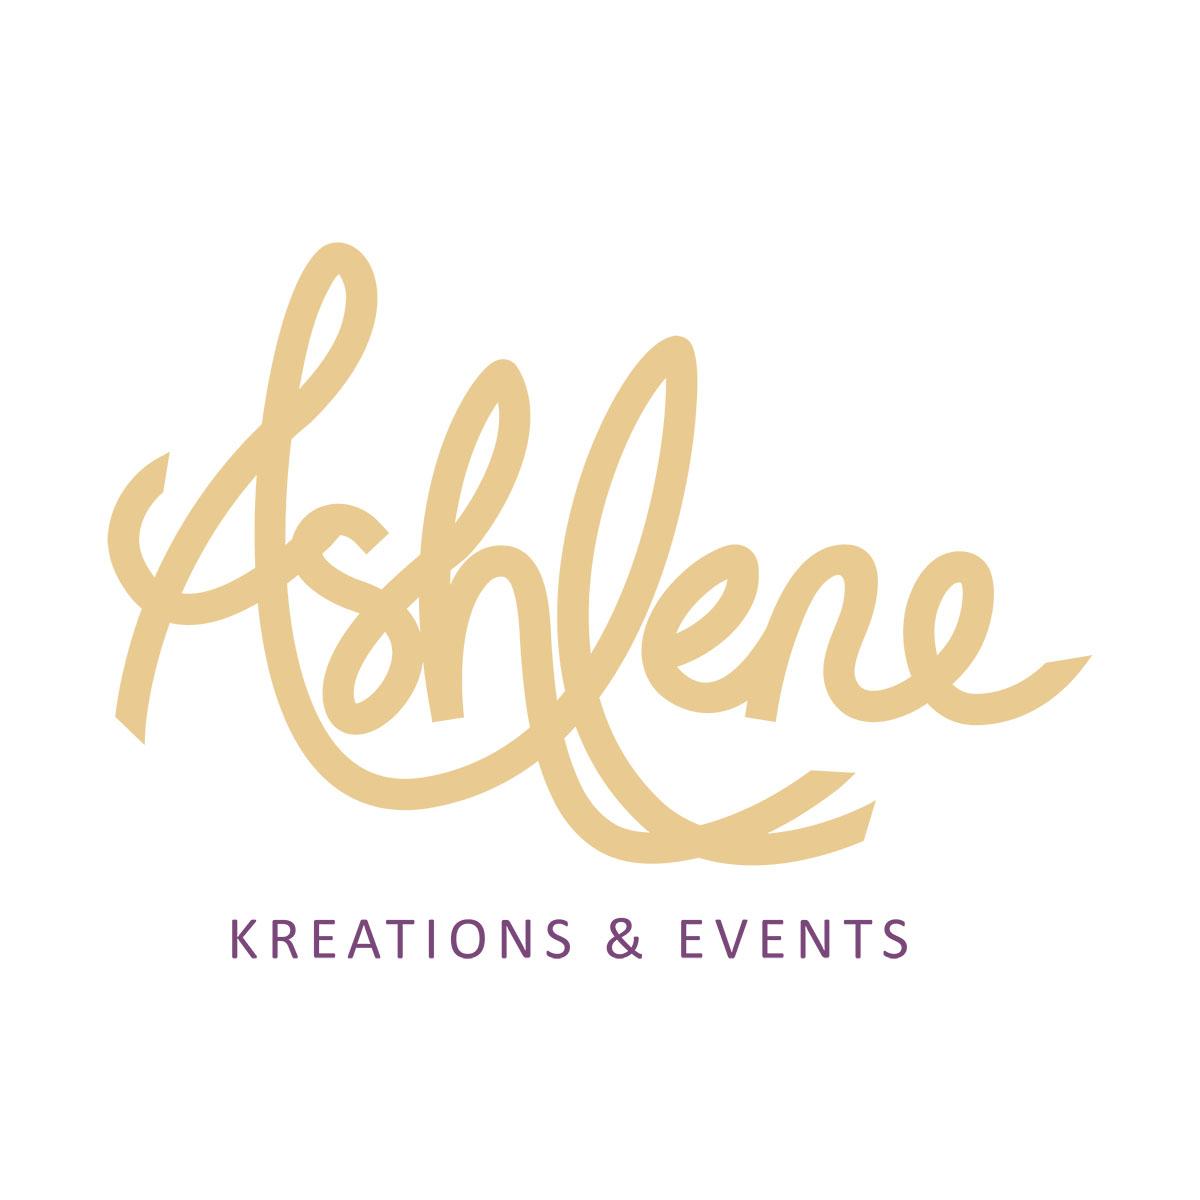 Ashlene Logo